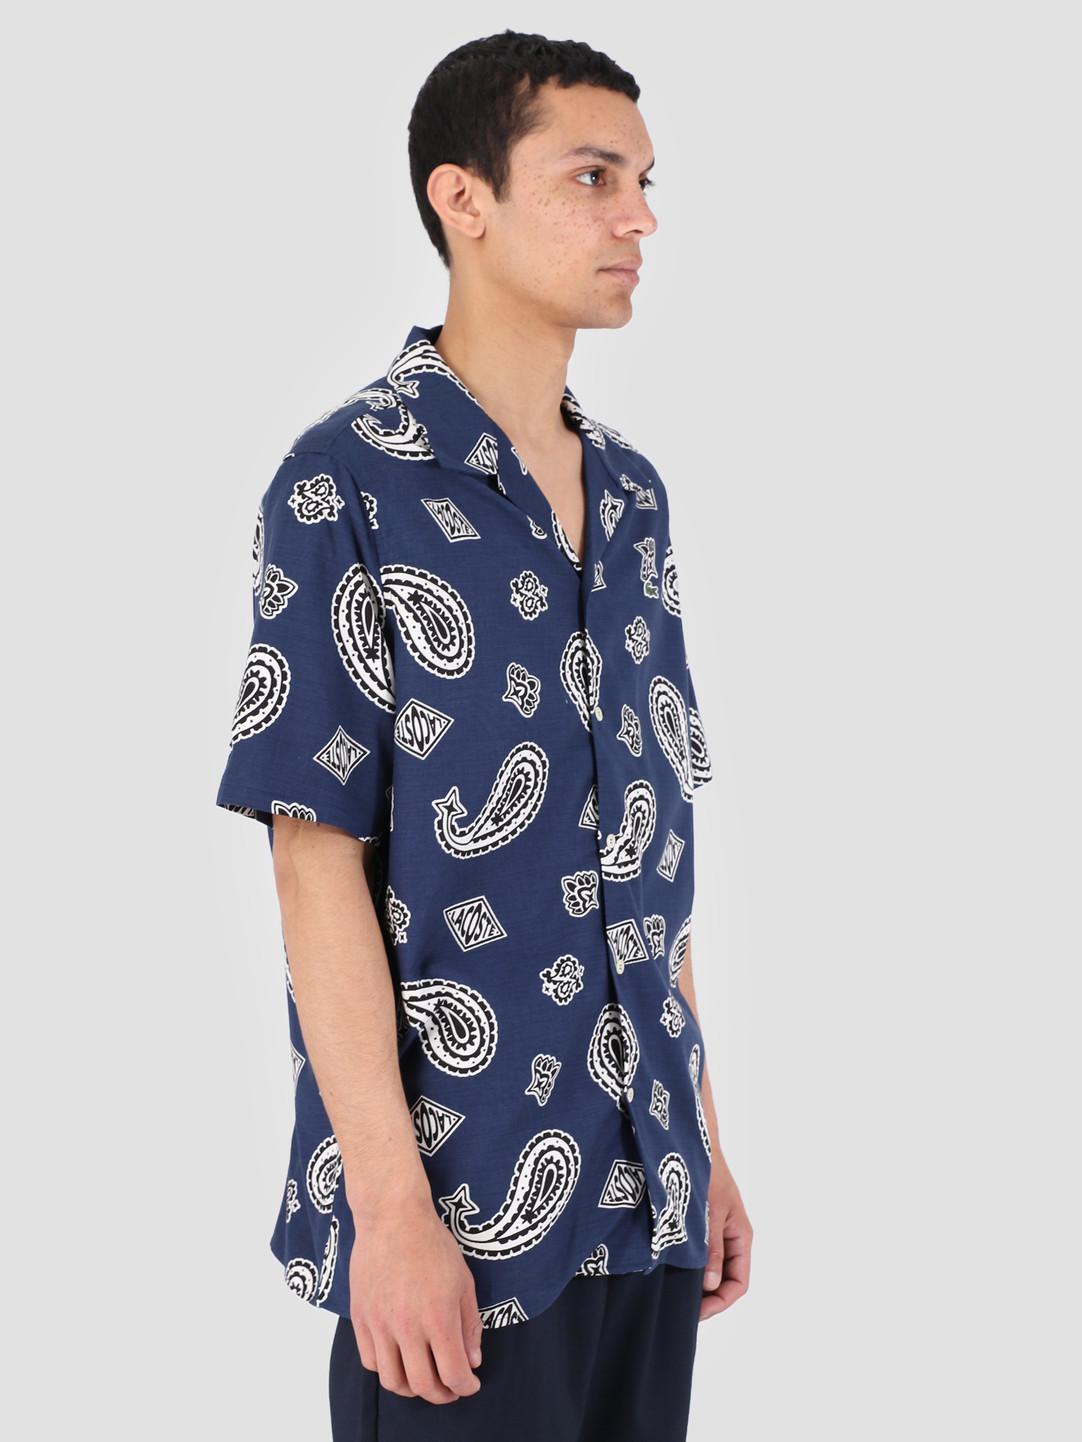 Lacoste Lacoste 1Hc1 Men'S Shortsleeve Woven Shirt 02 Methylene Multico Ch3776-91